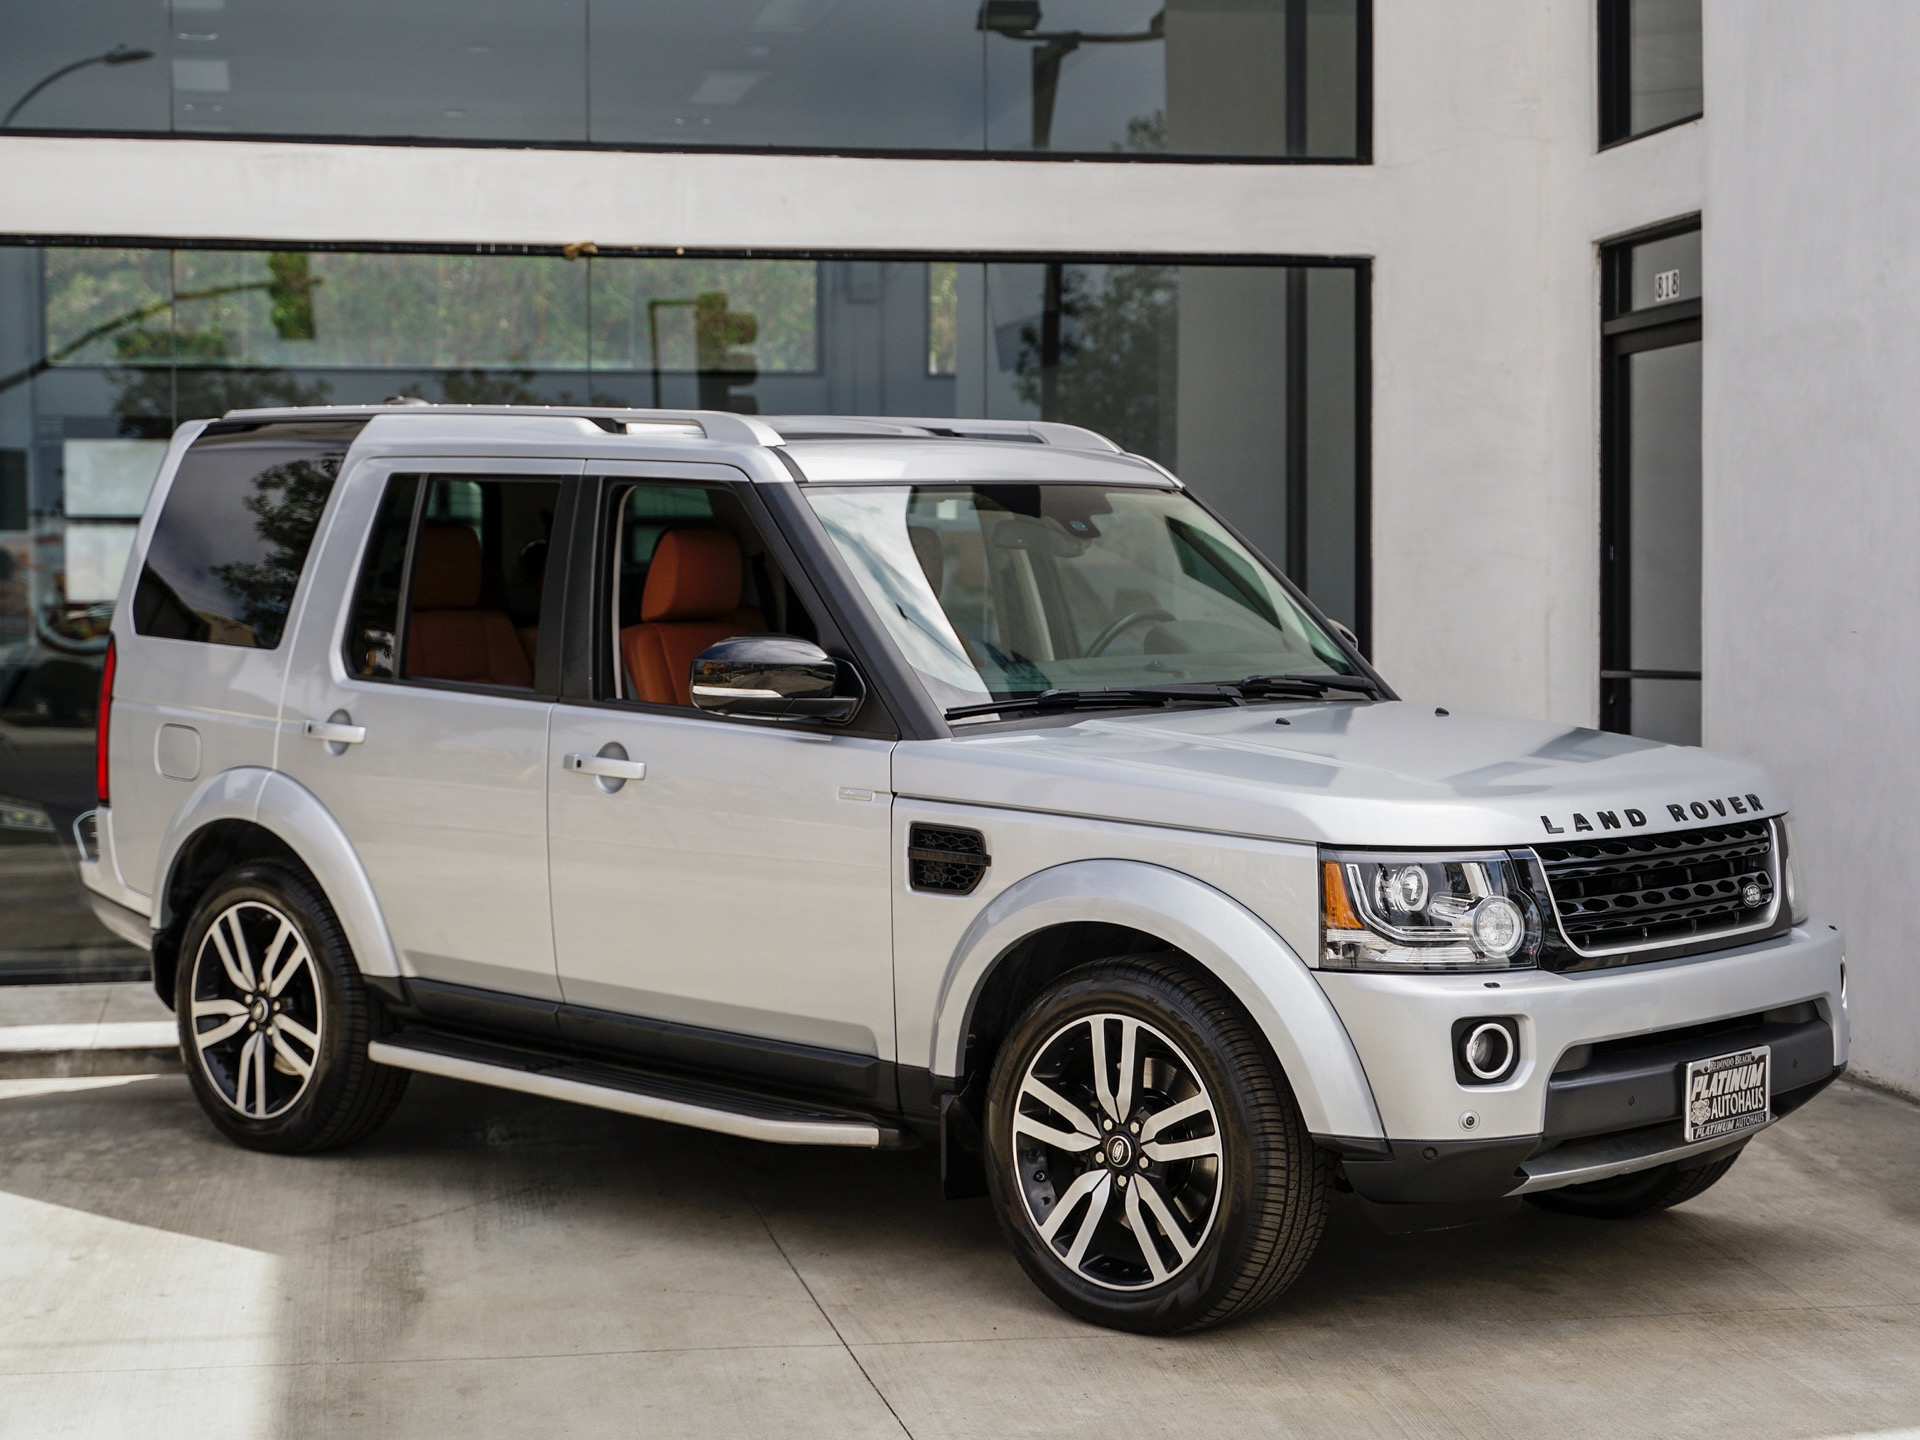 Used-2016-Land-Rover-LR4-Landmark